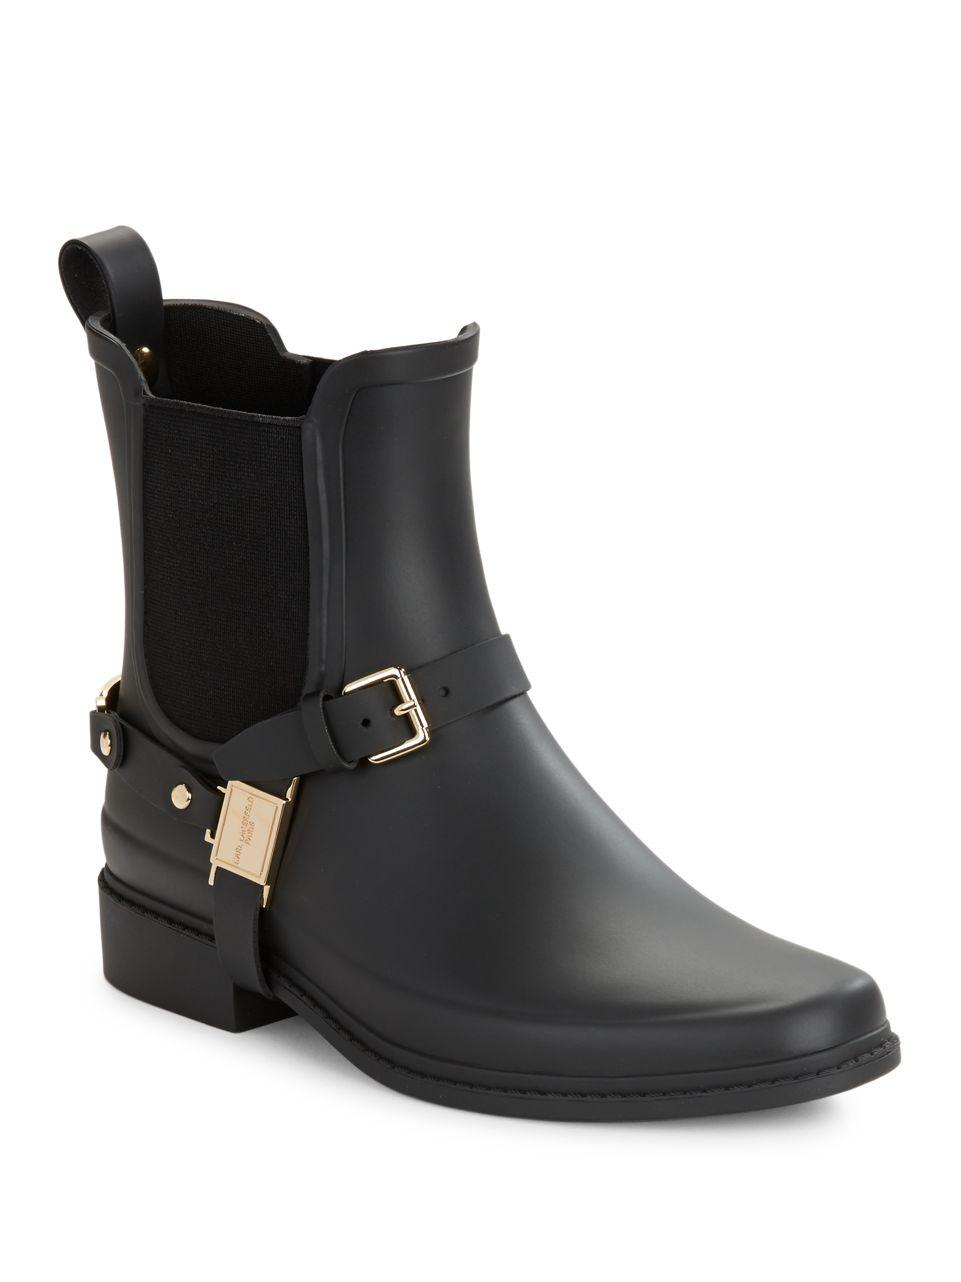 Karl Lagerfeld Lou Rain Boots In Black Lyst